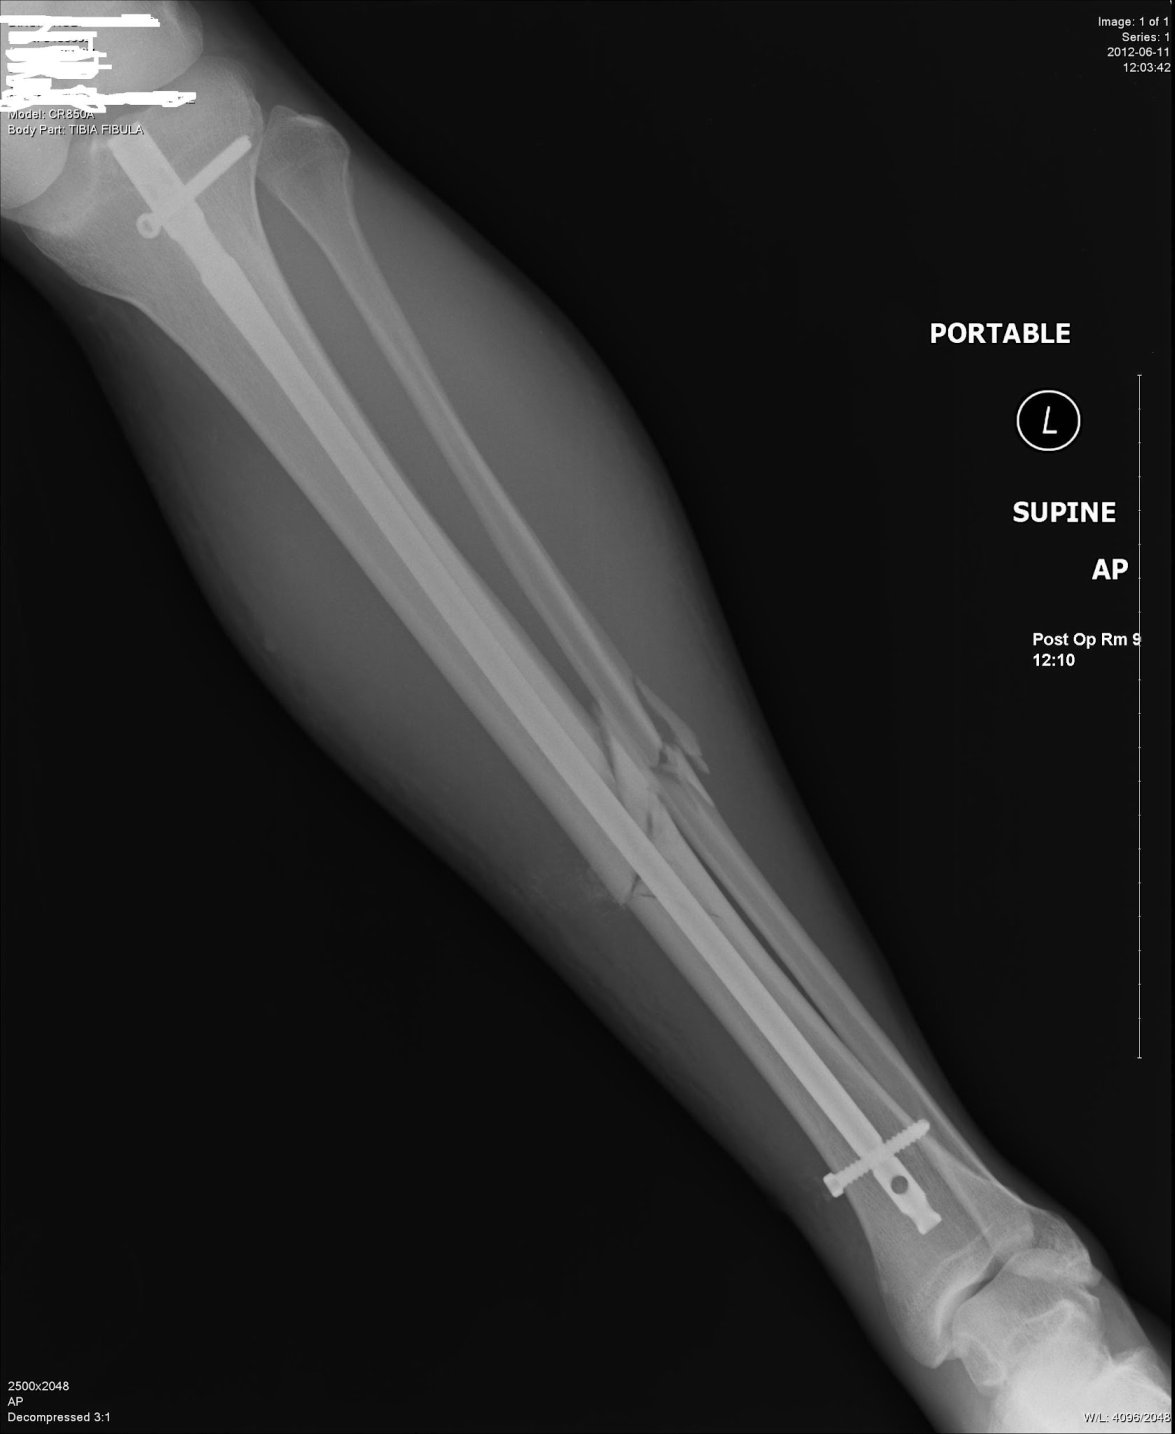 Fractured Tibia and Fibula (Broken Lower Leg Bones) with